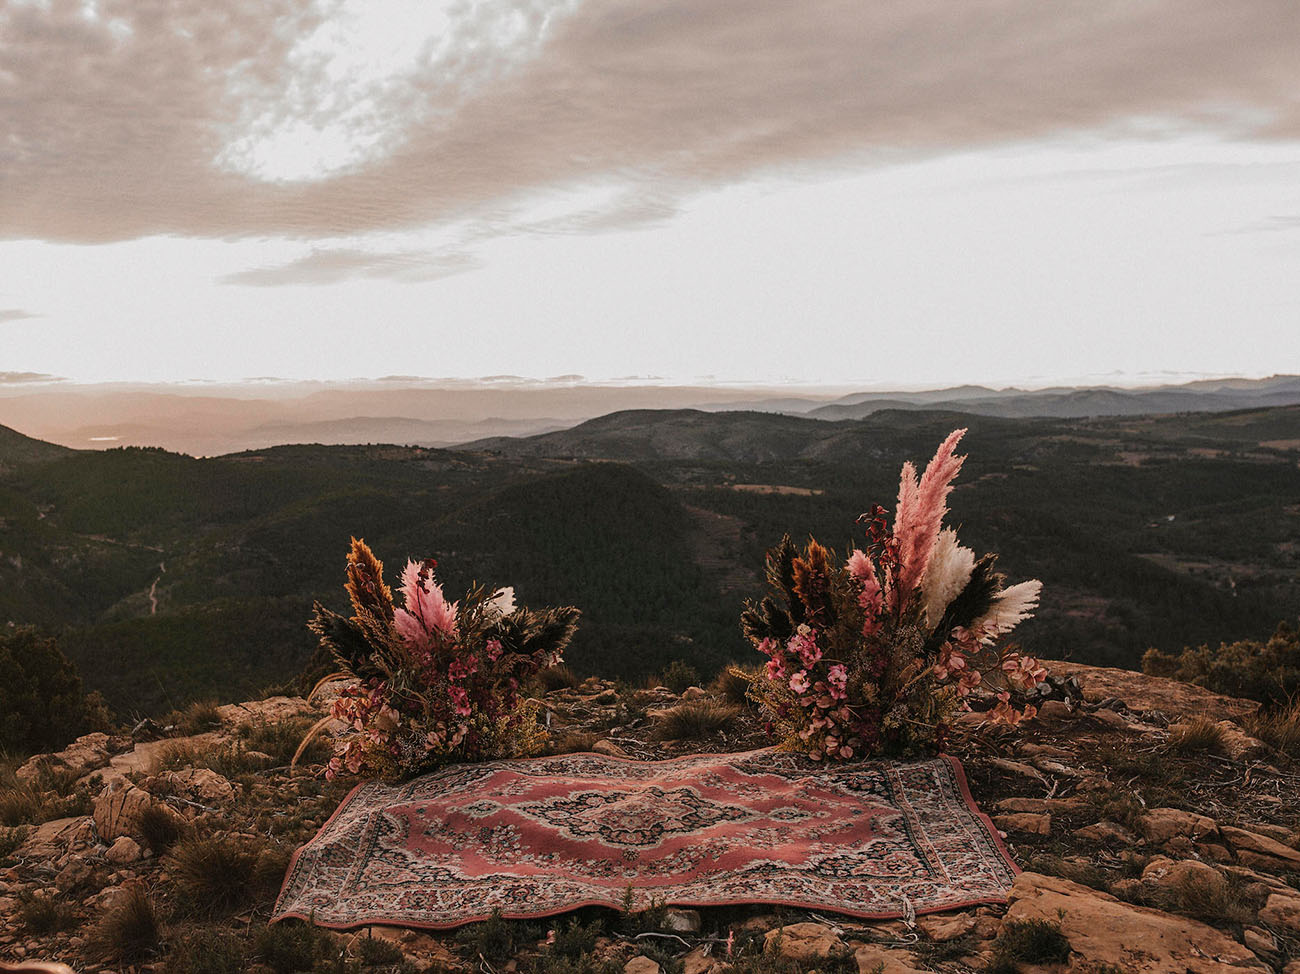 Sierra Calderona National Park Elopement